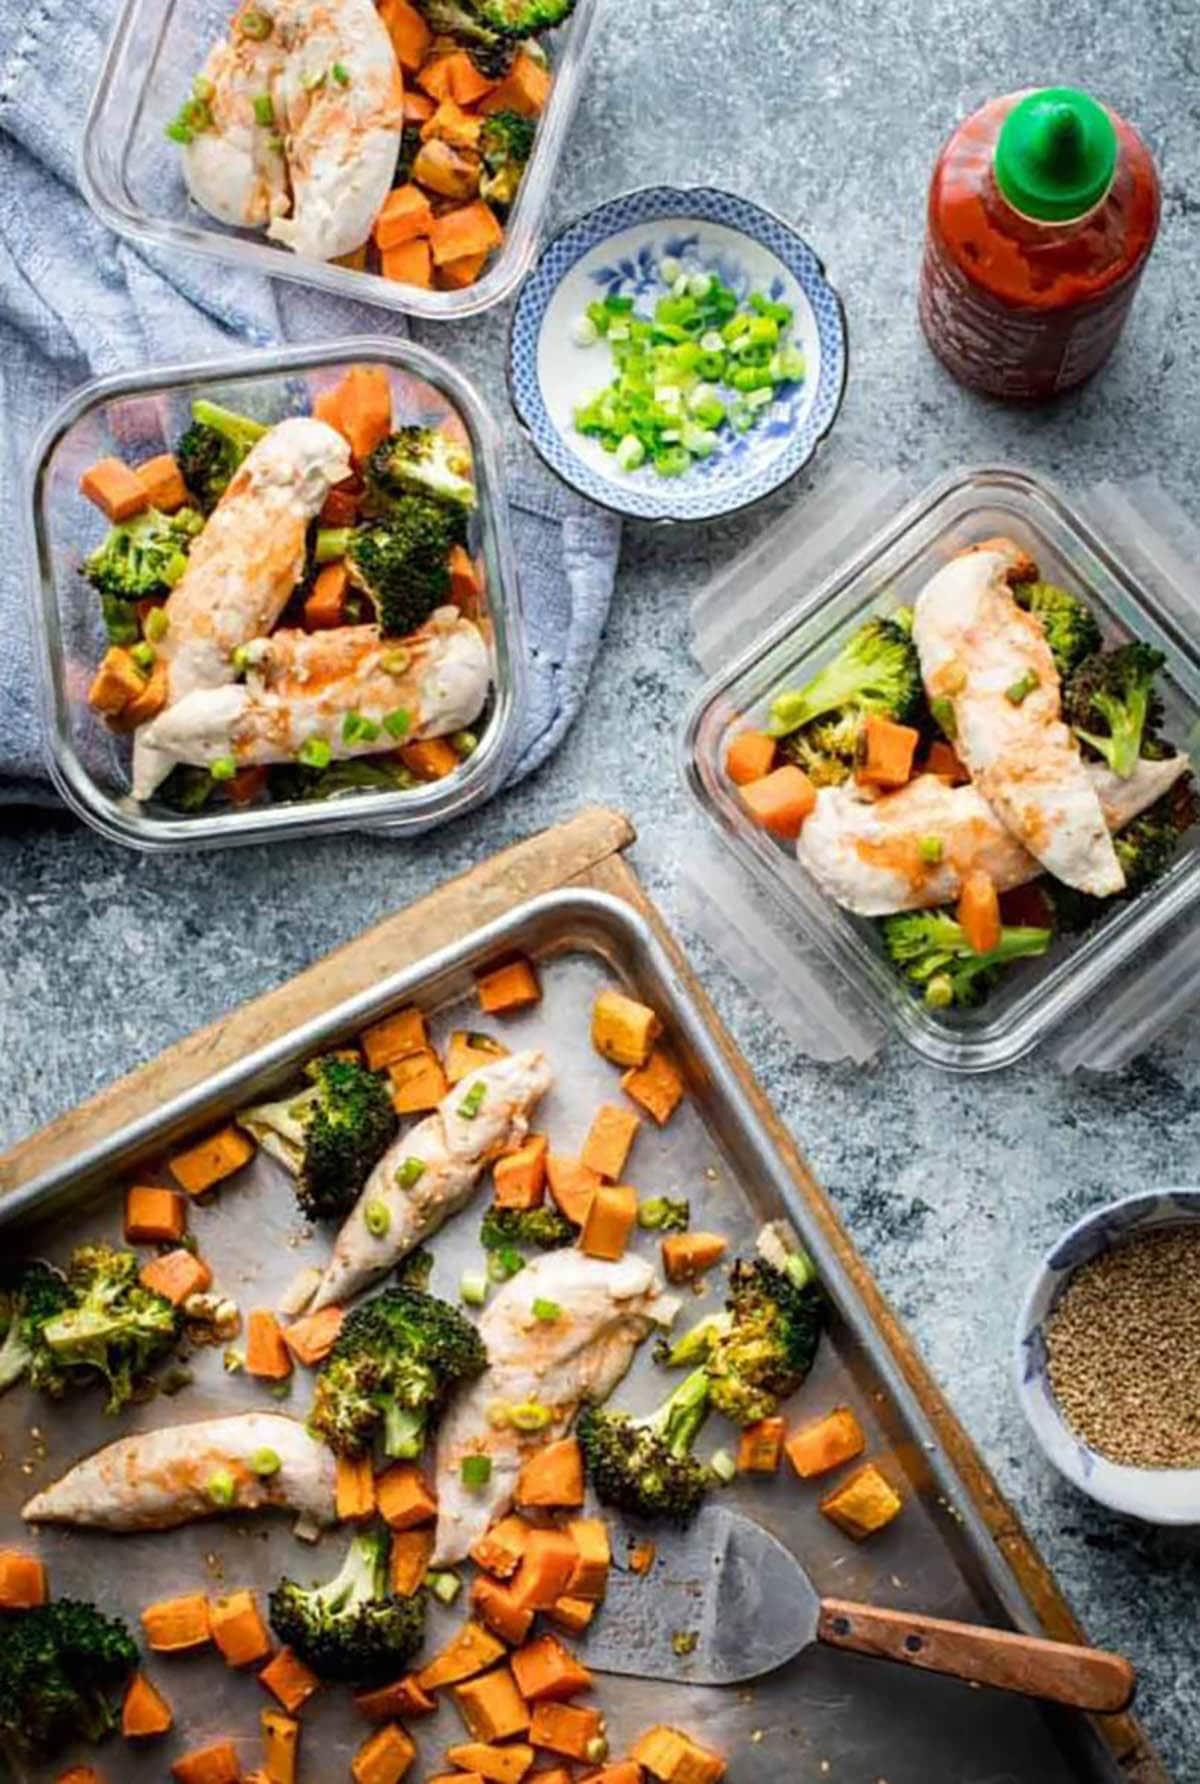 Sheet Pan Chicken and Broccoli with Honey Sriracha Sauce